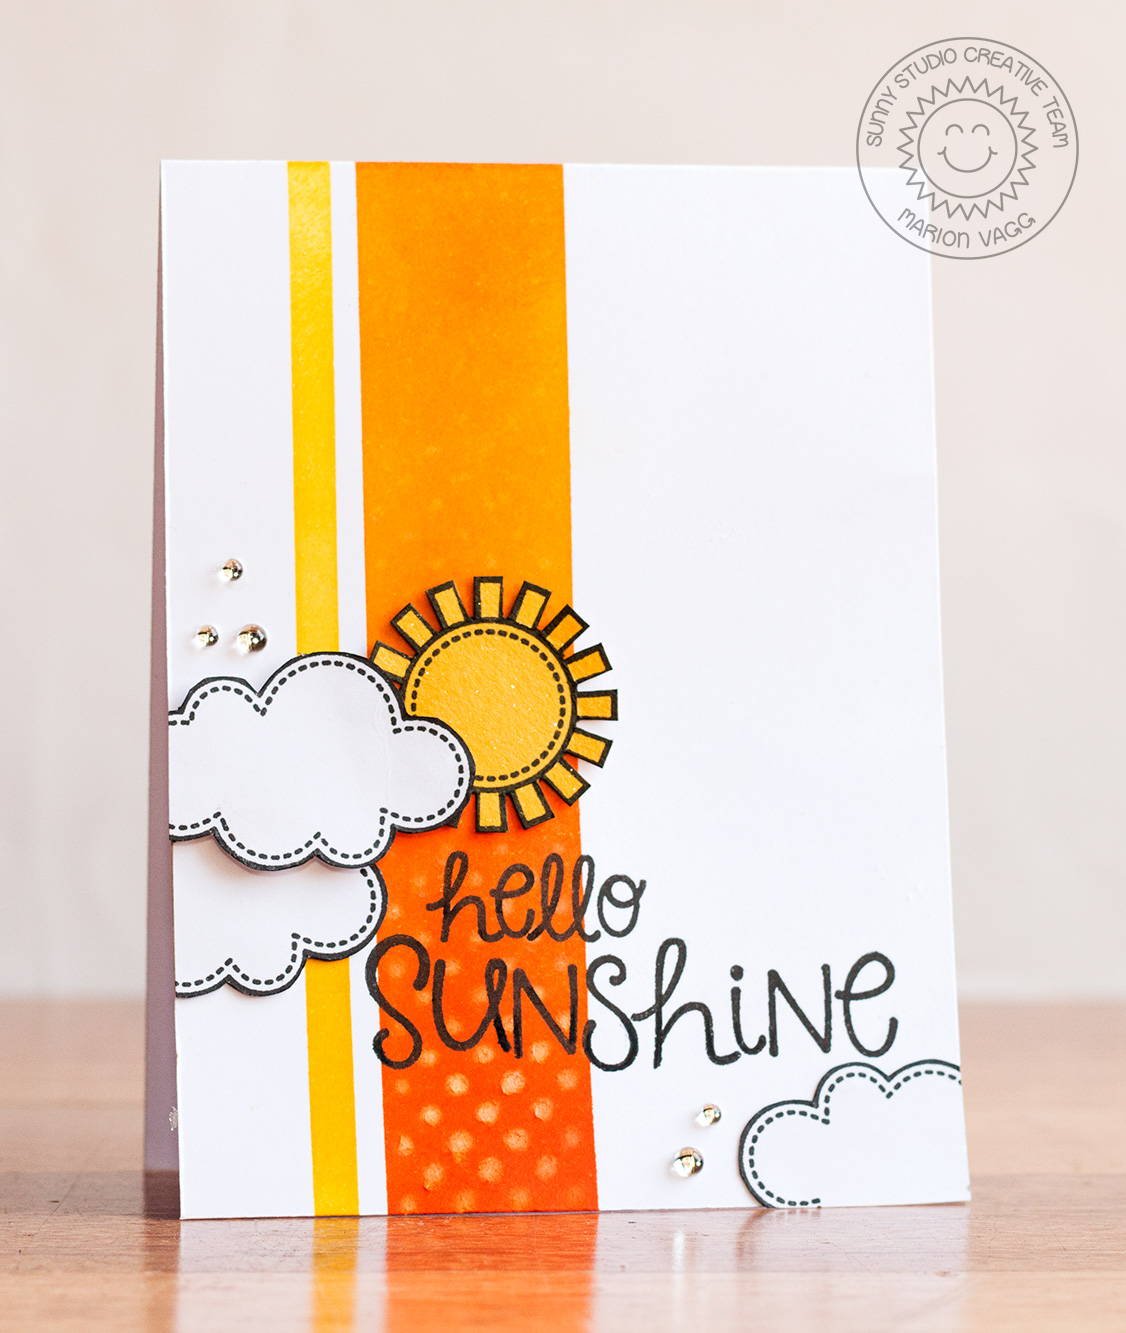 Hello Sunshine - Sunny Studio | Marion Vagg